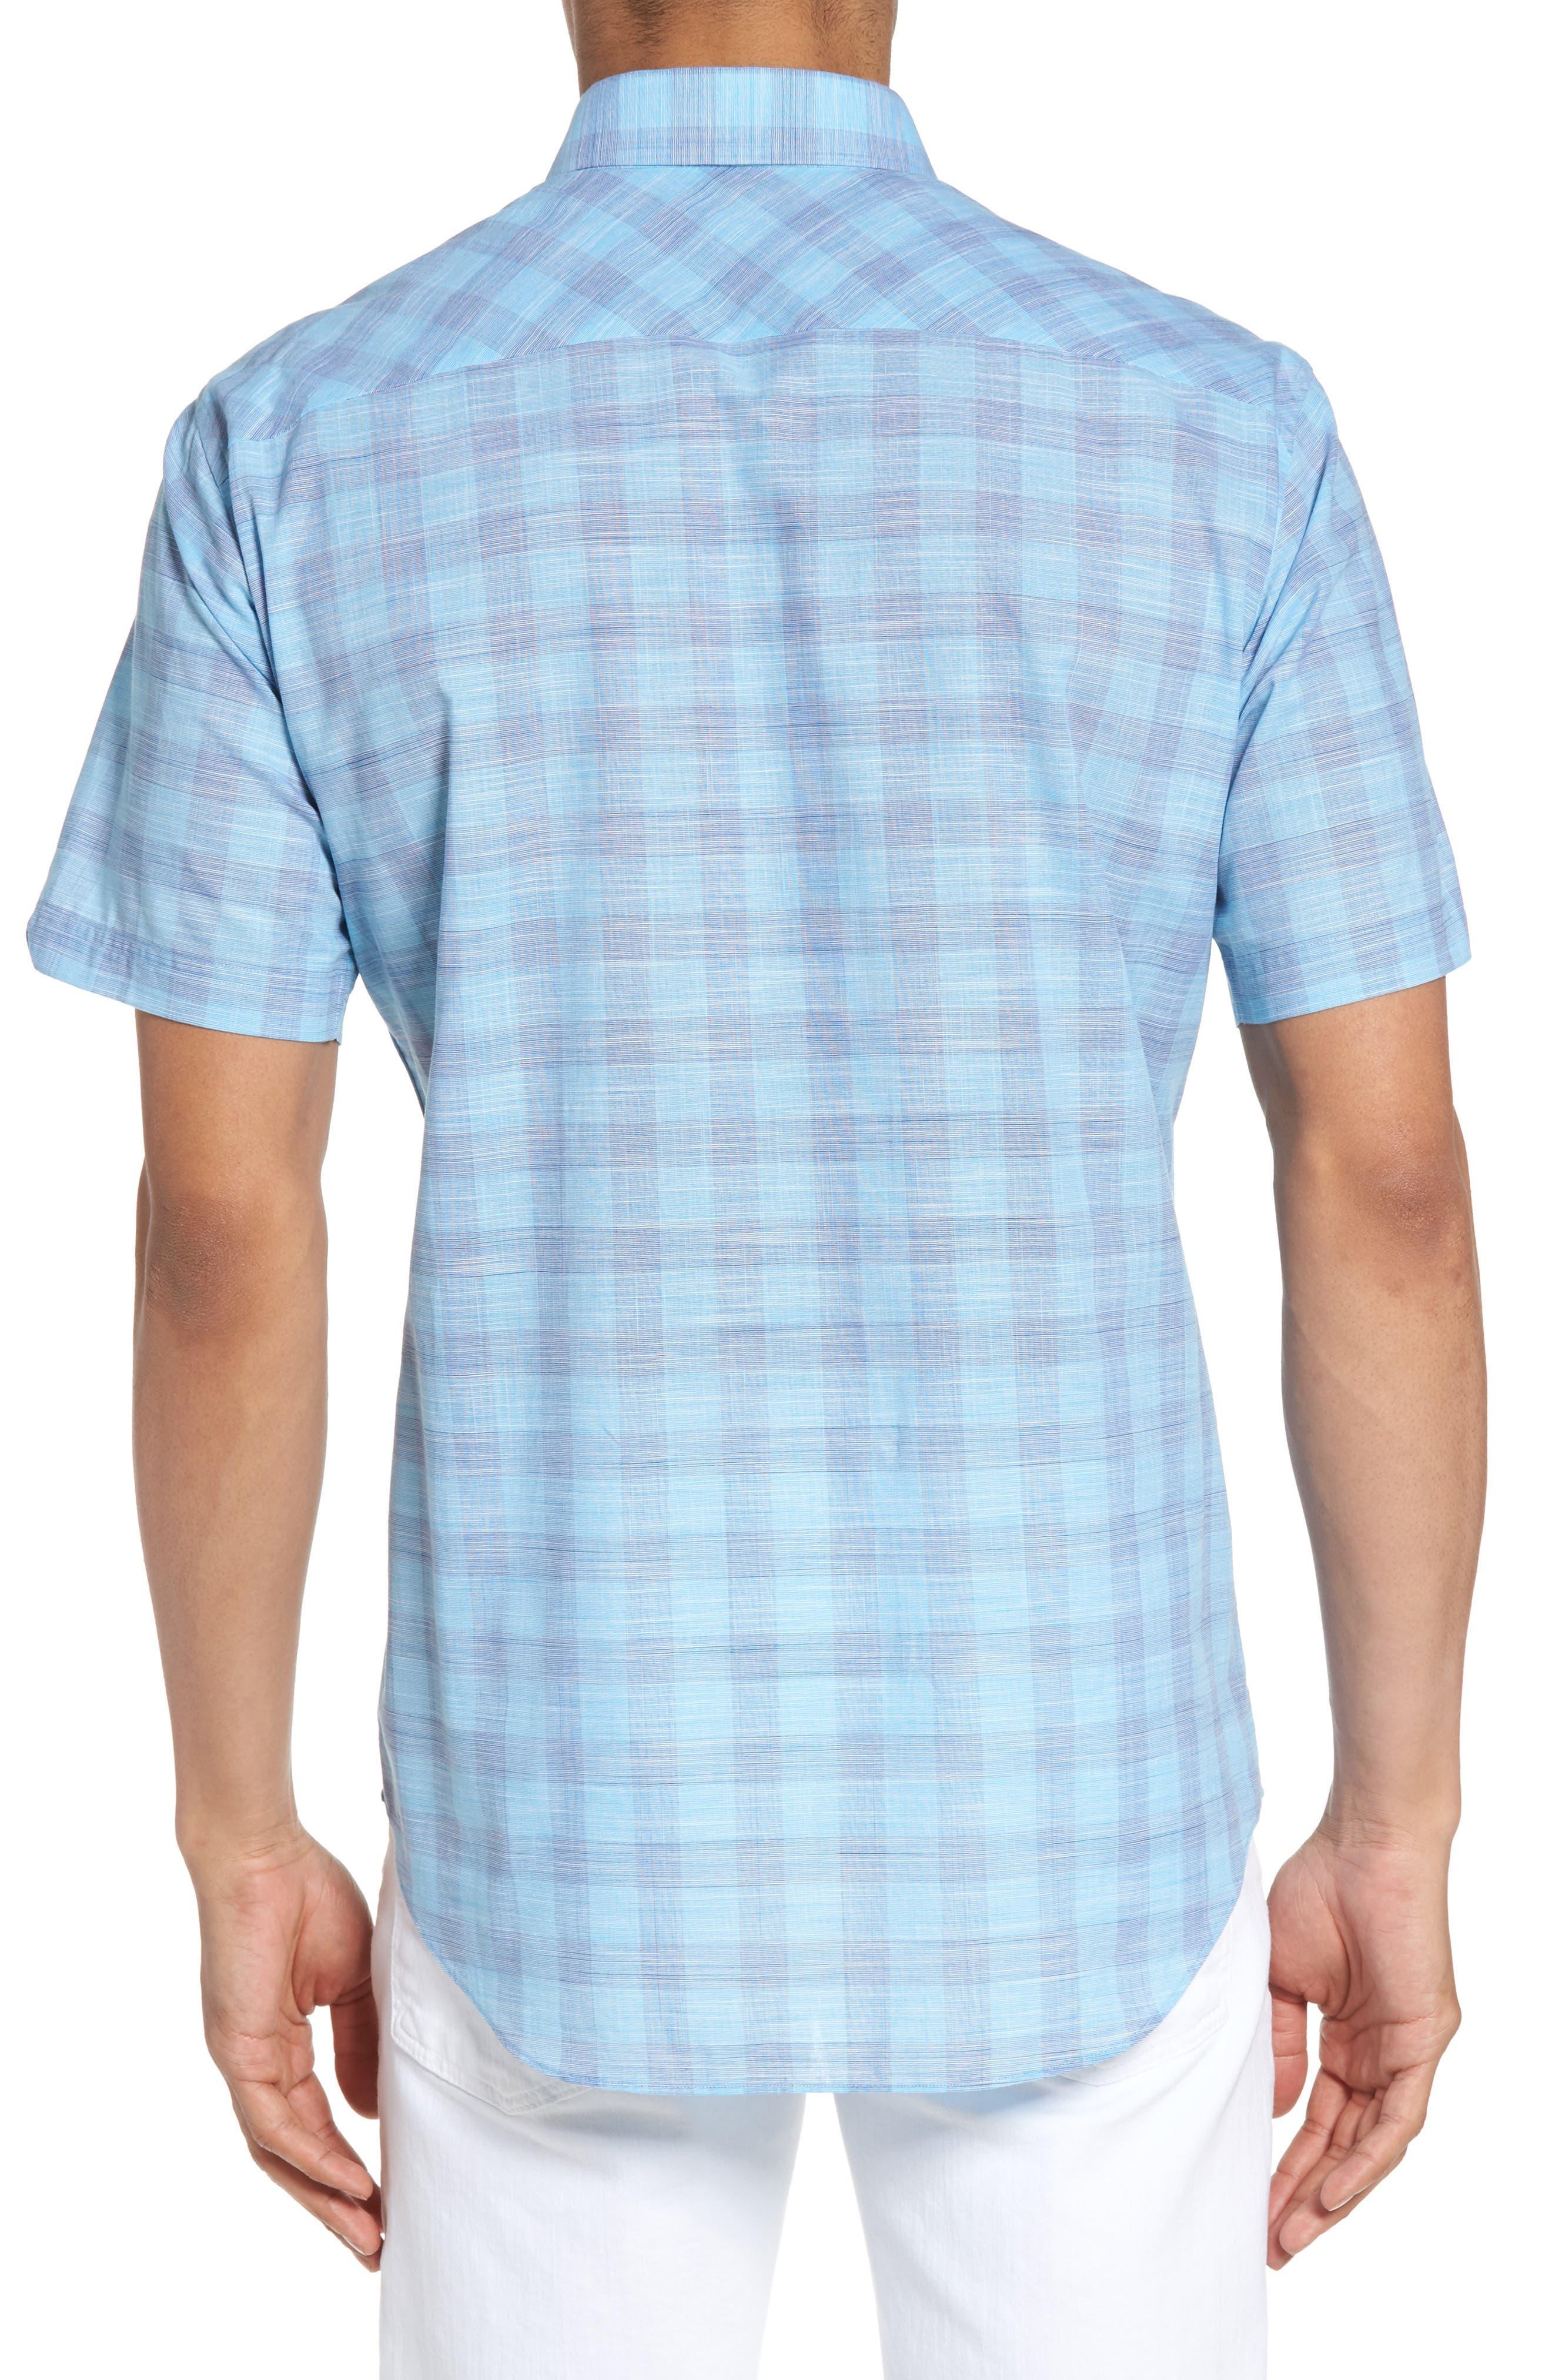 Hasanagic Trim Fit Plaid Sport Shirt,                             Alternate thumbnail 2, color,                             439